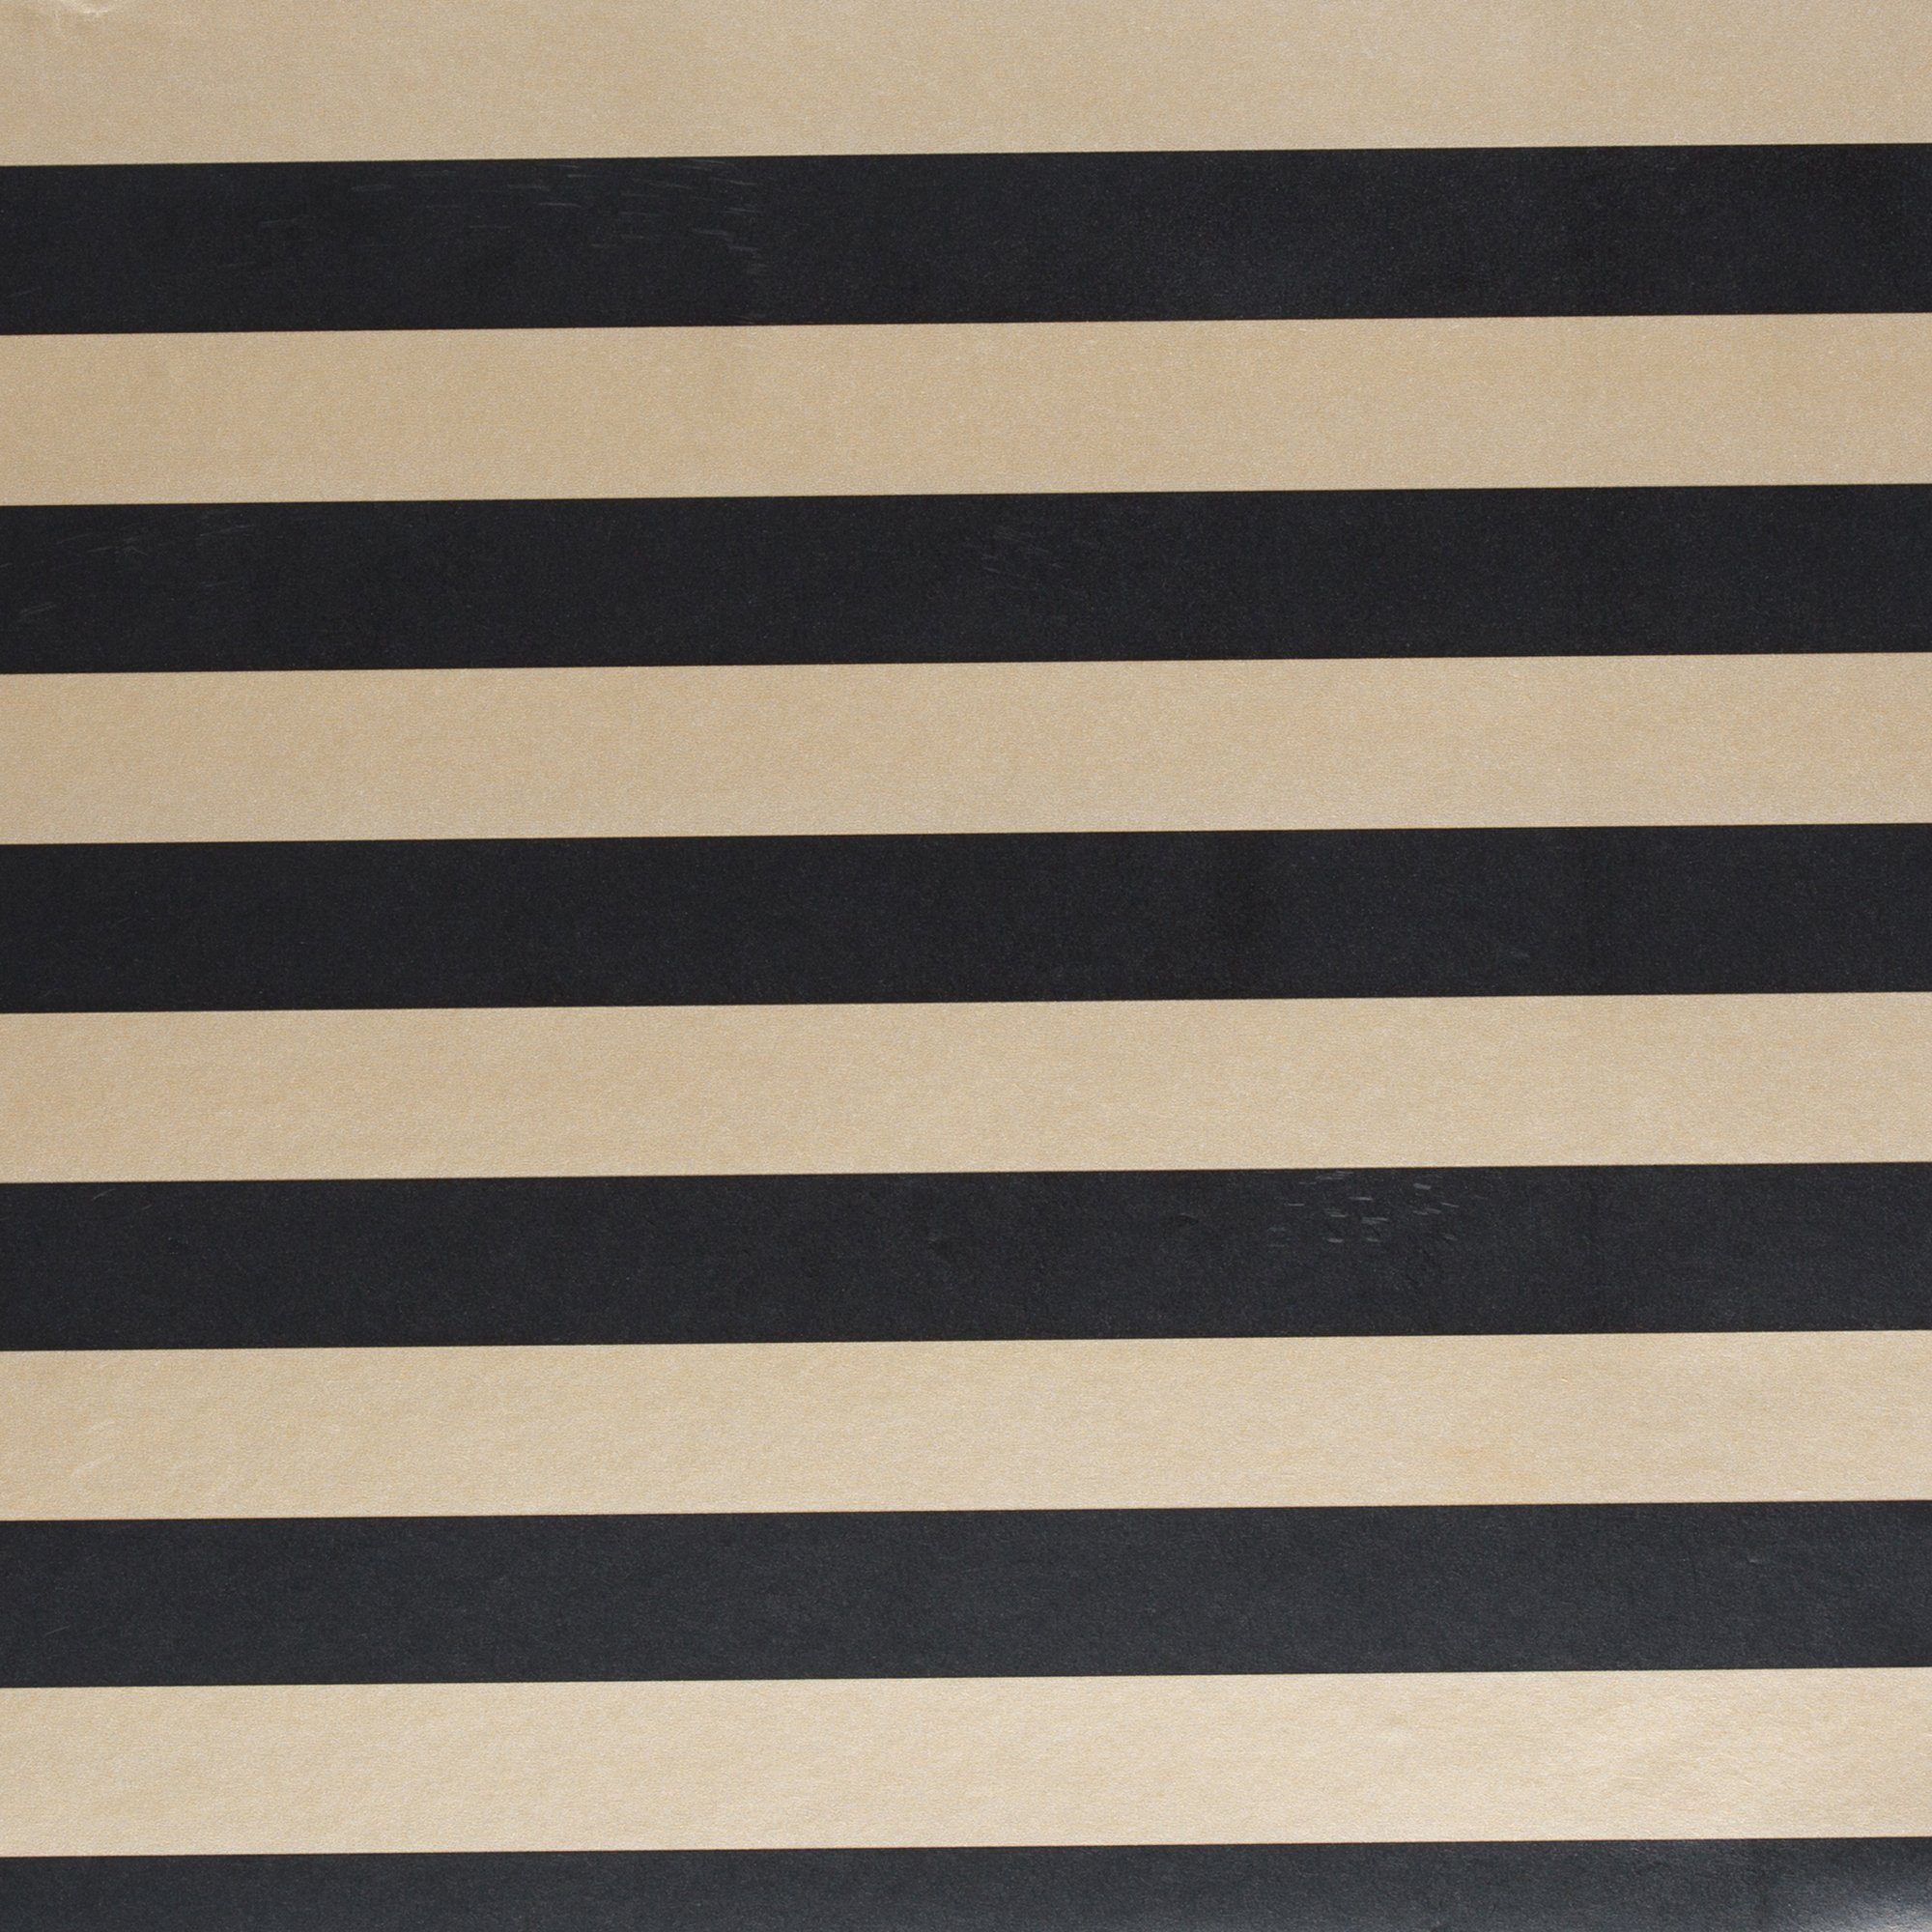 Jillson & Roberts Gift Wrap, Black Gold Stripe (8 Rolls 5ft x 30in)